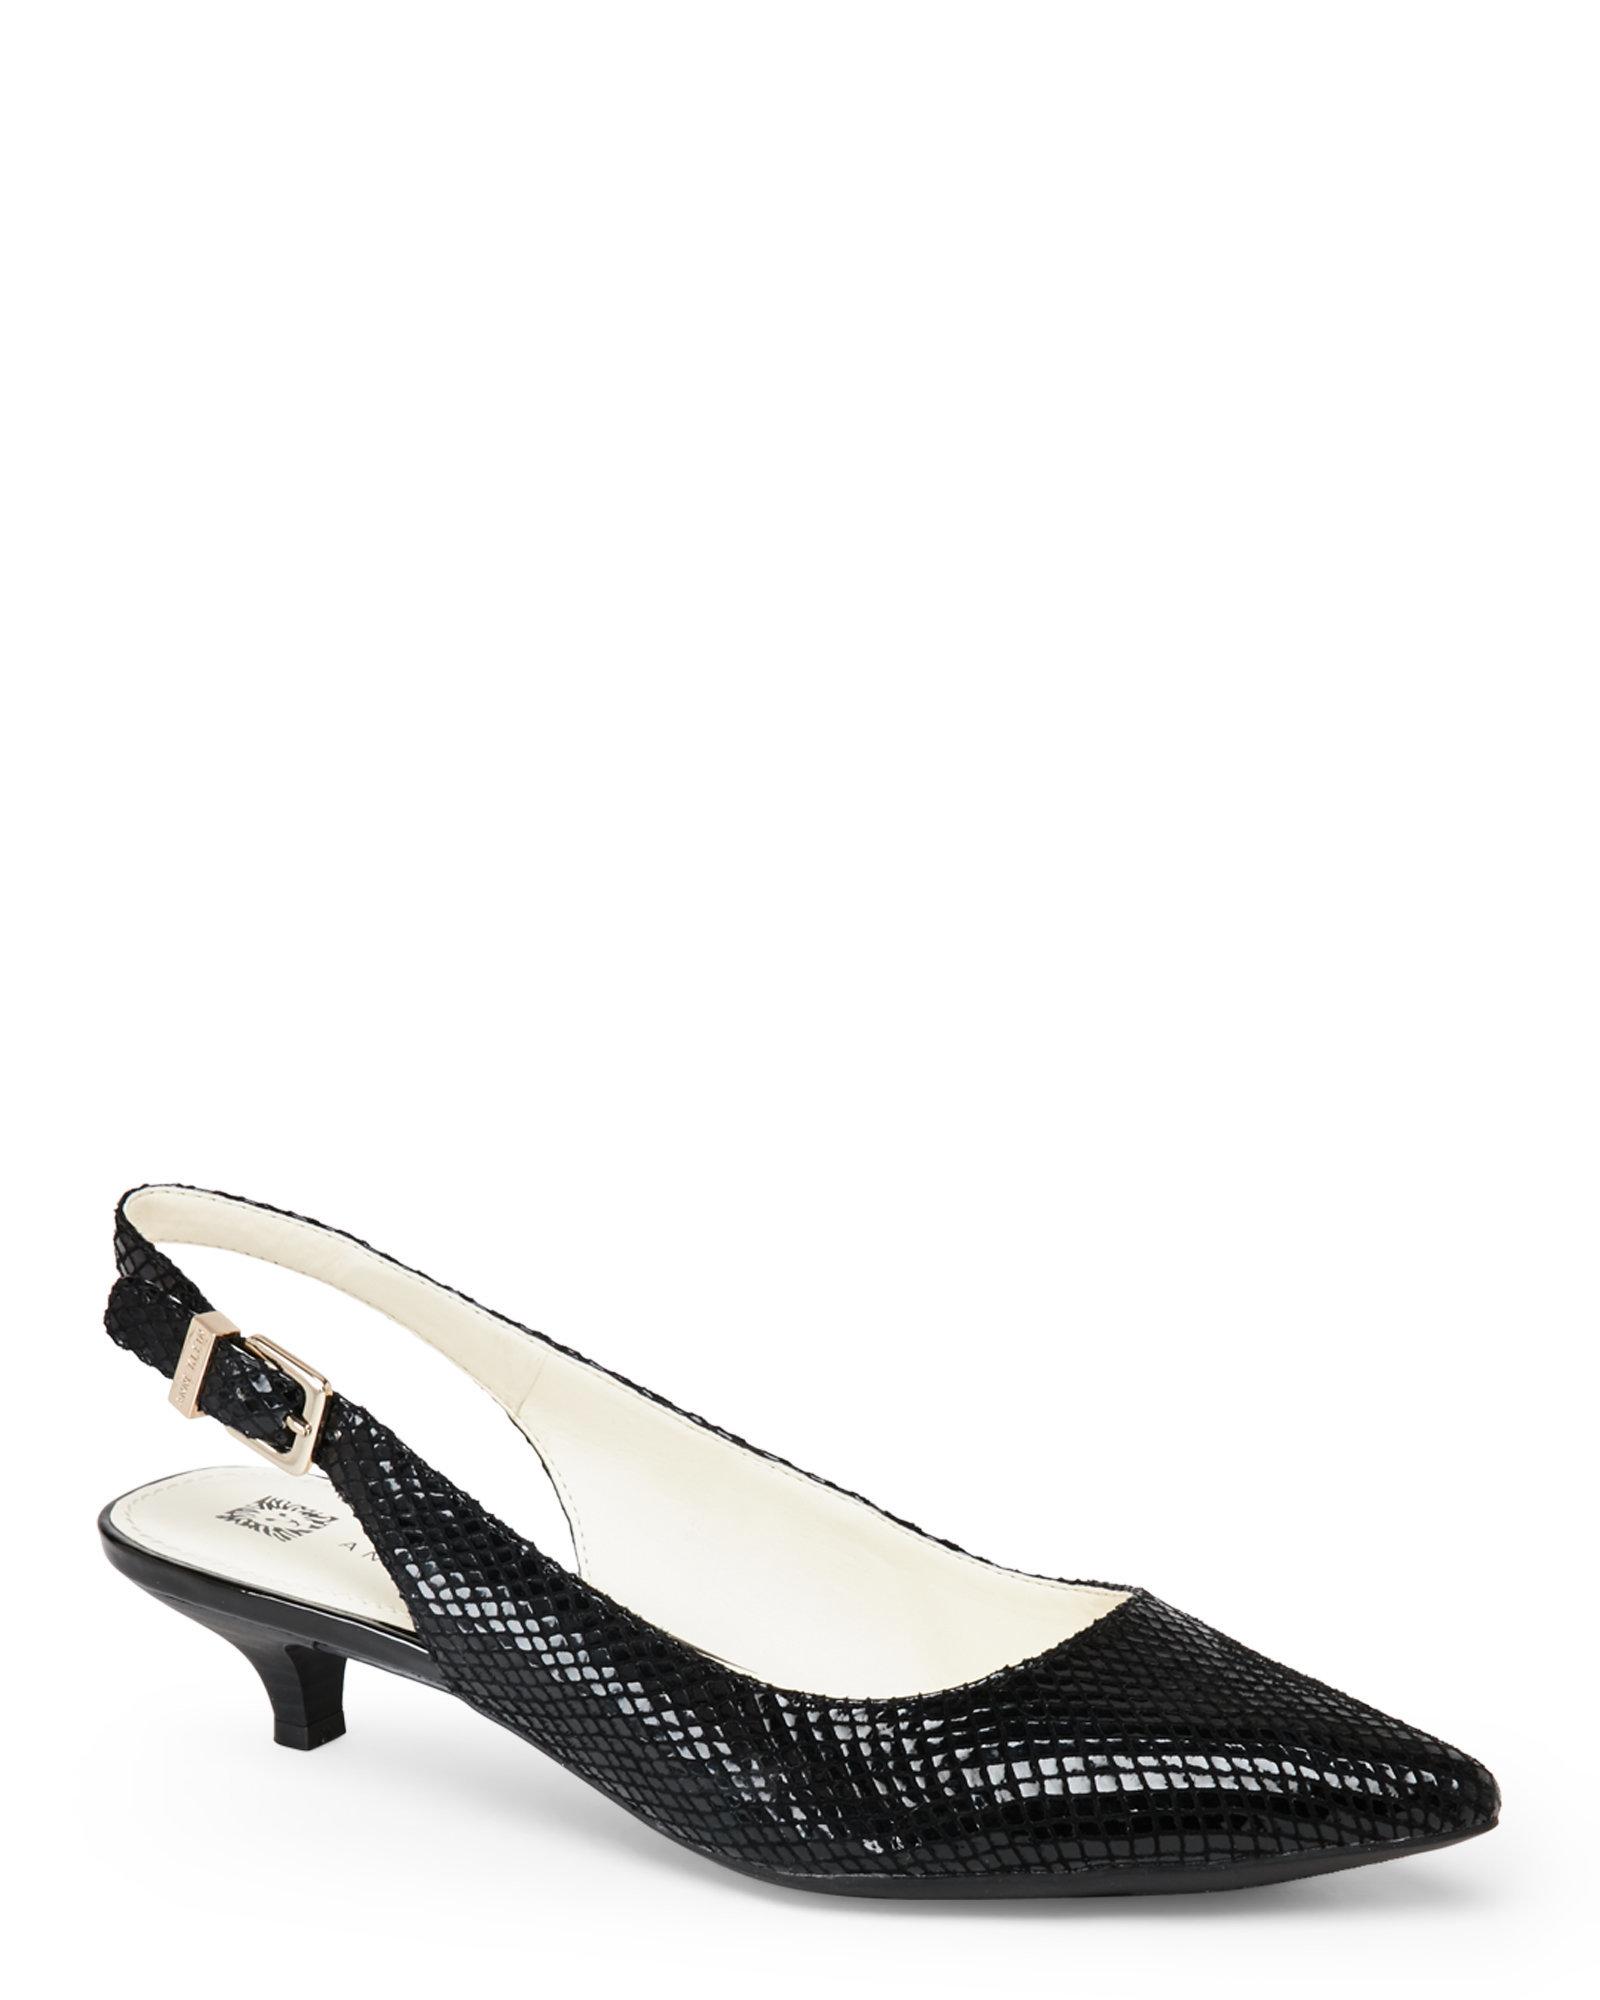 J Renee Shoes